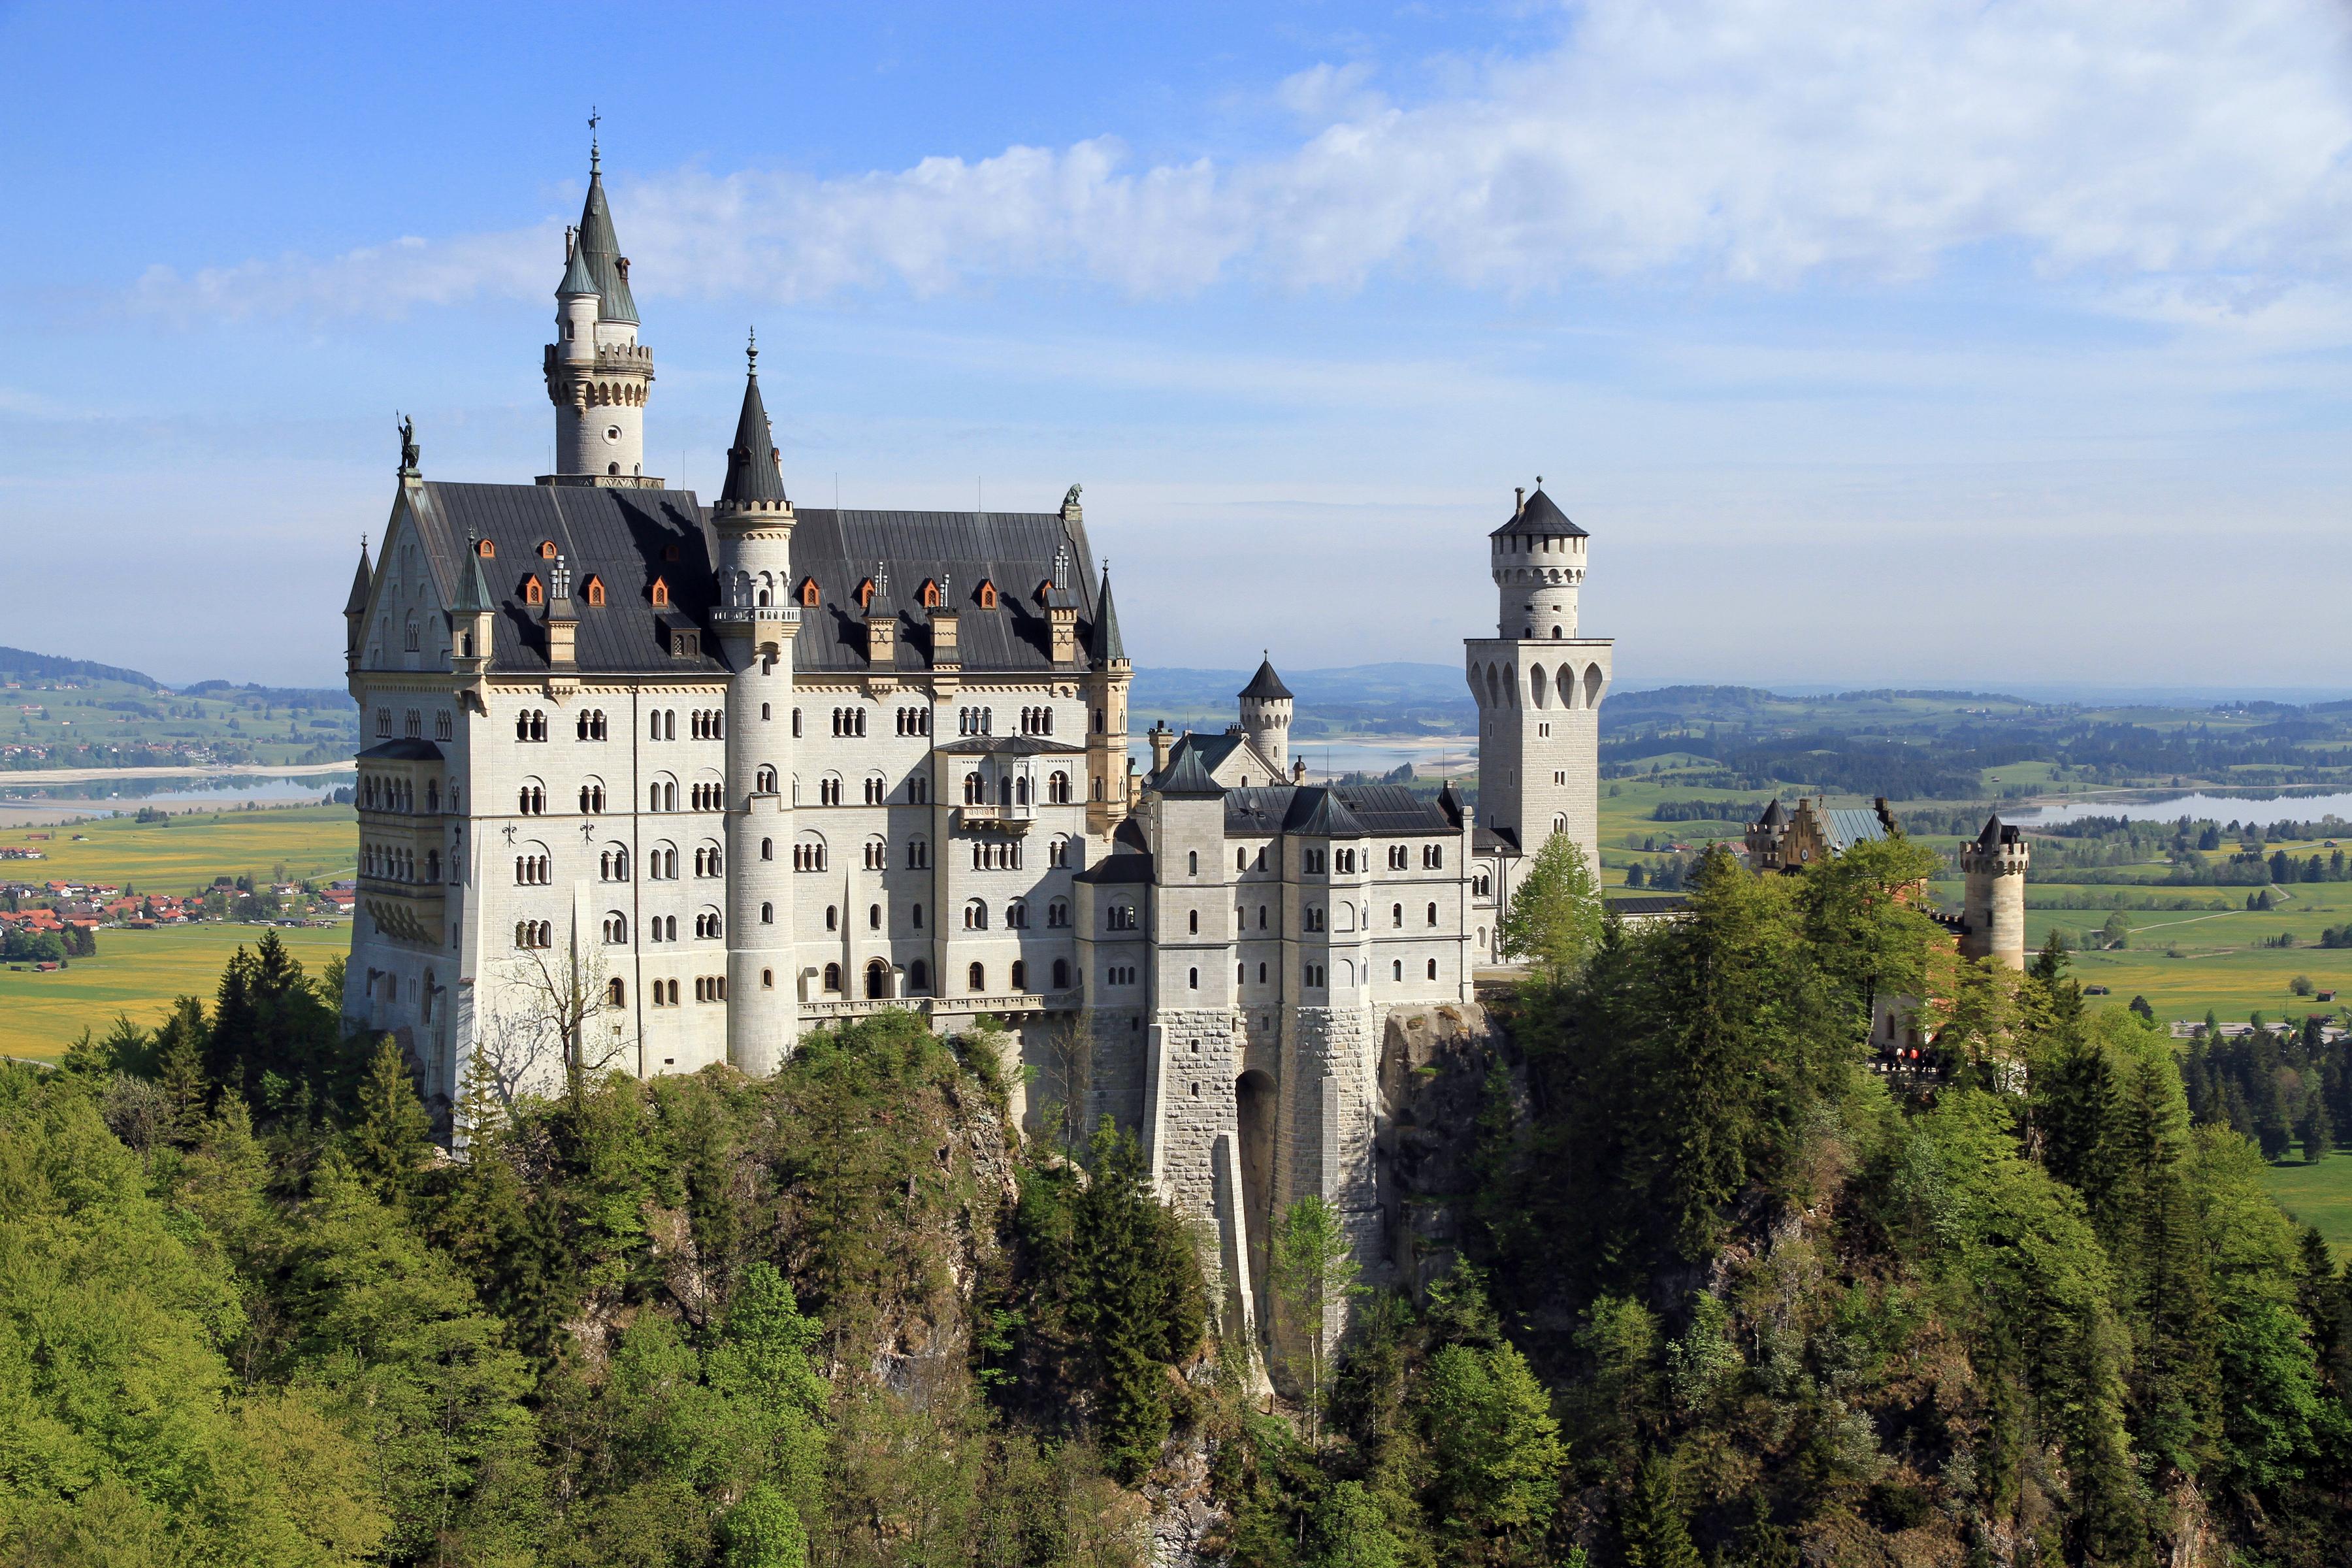 Schloss Neuschwanstein Wikipedia